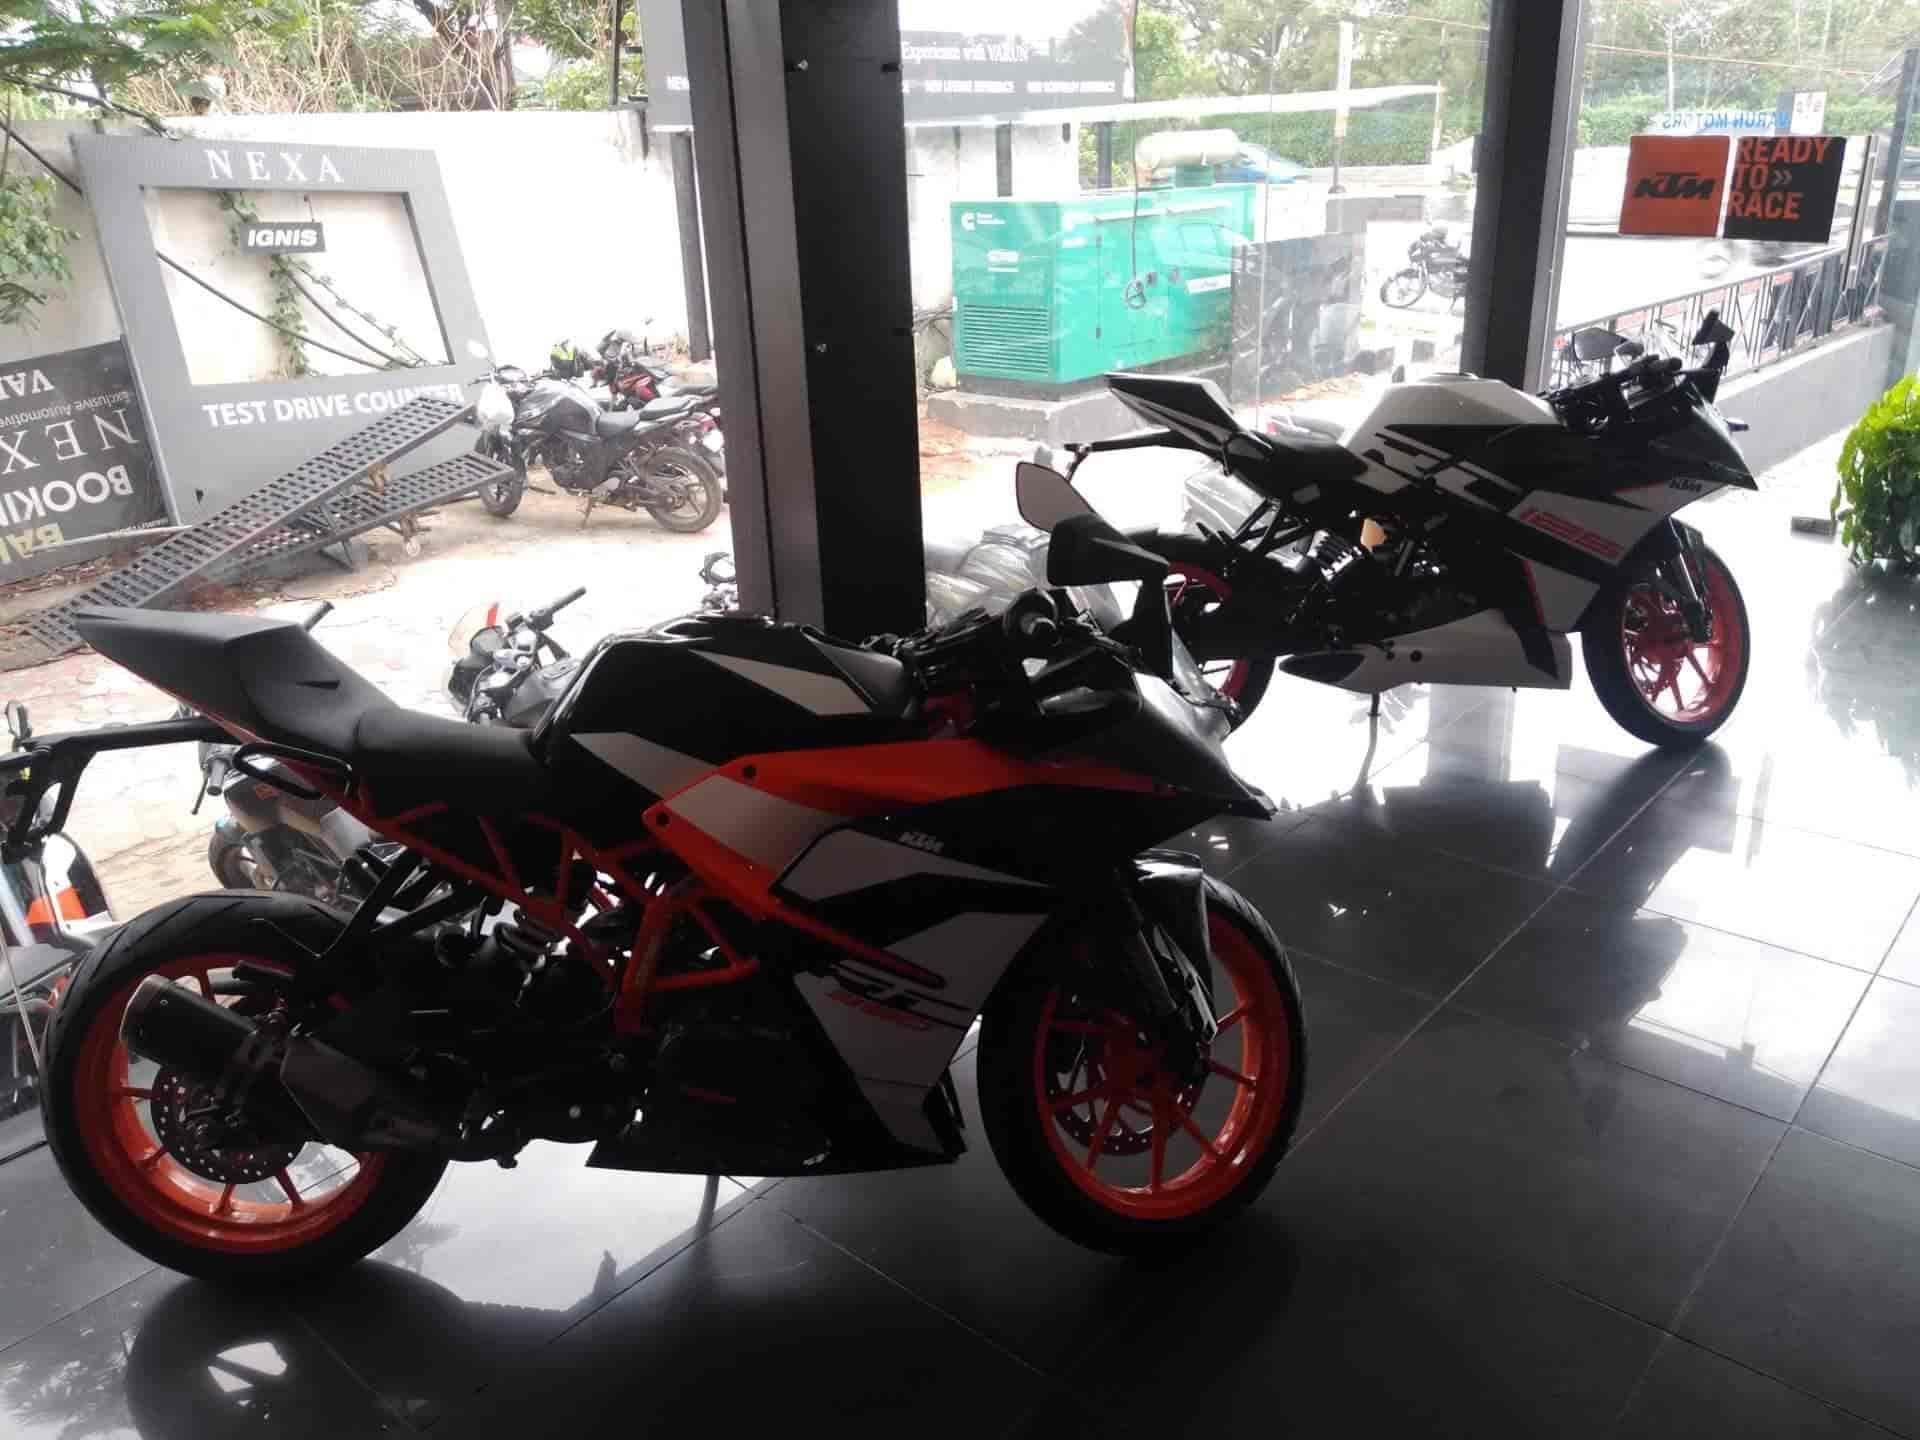 Ktm, Banjara Hills - Motorcycle Repair & Services in Hyderabad